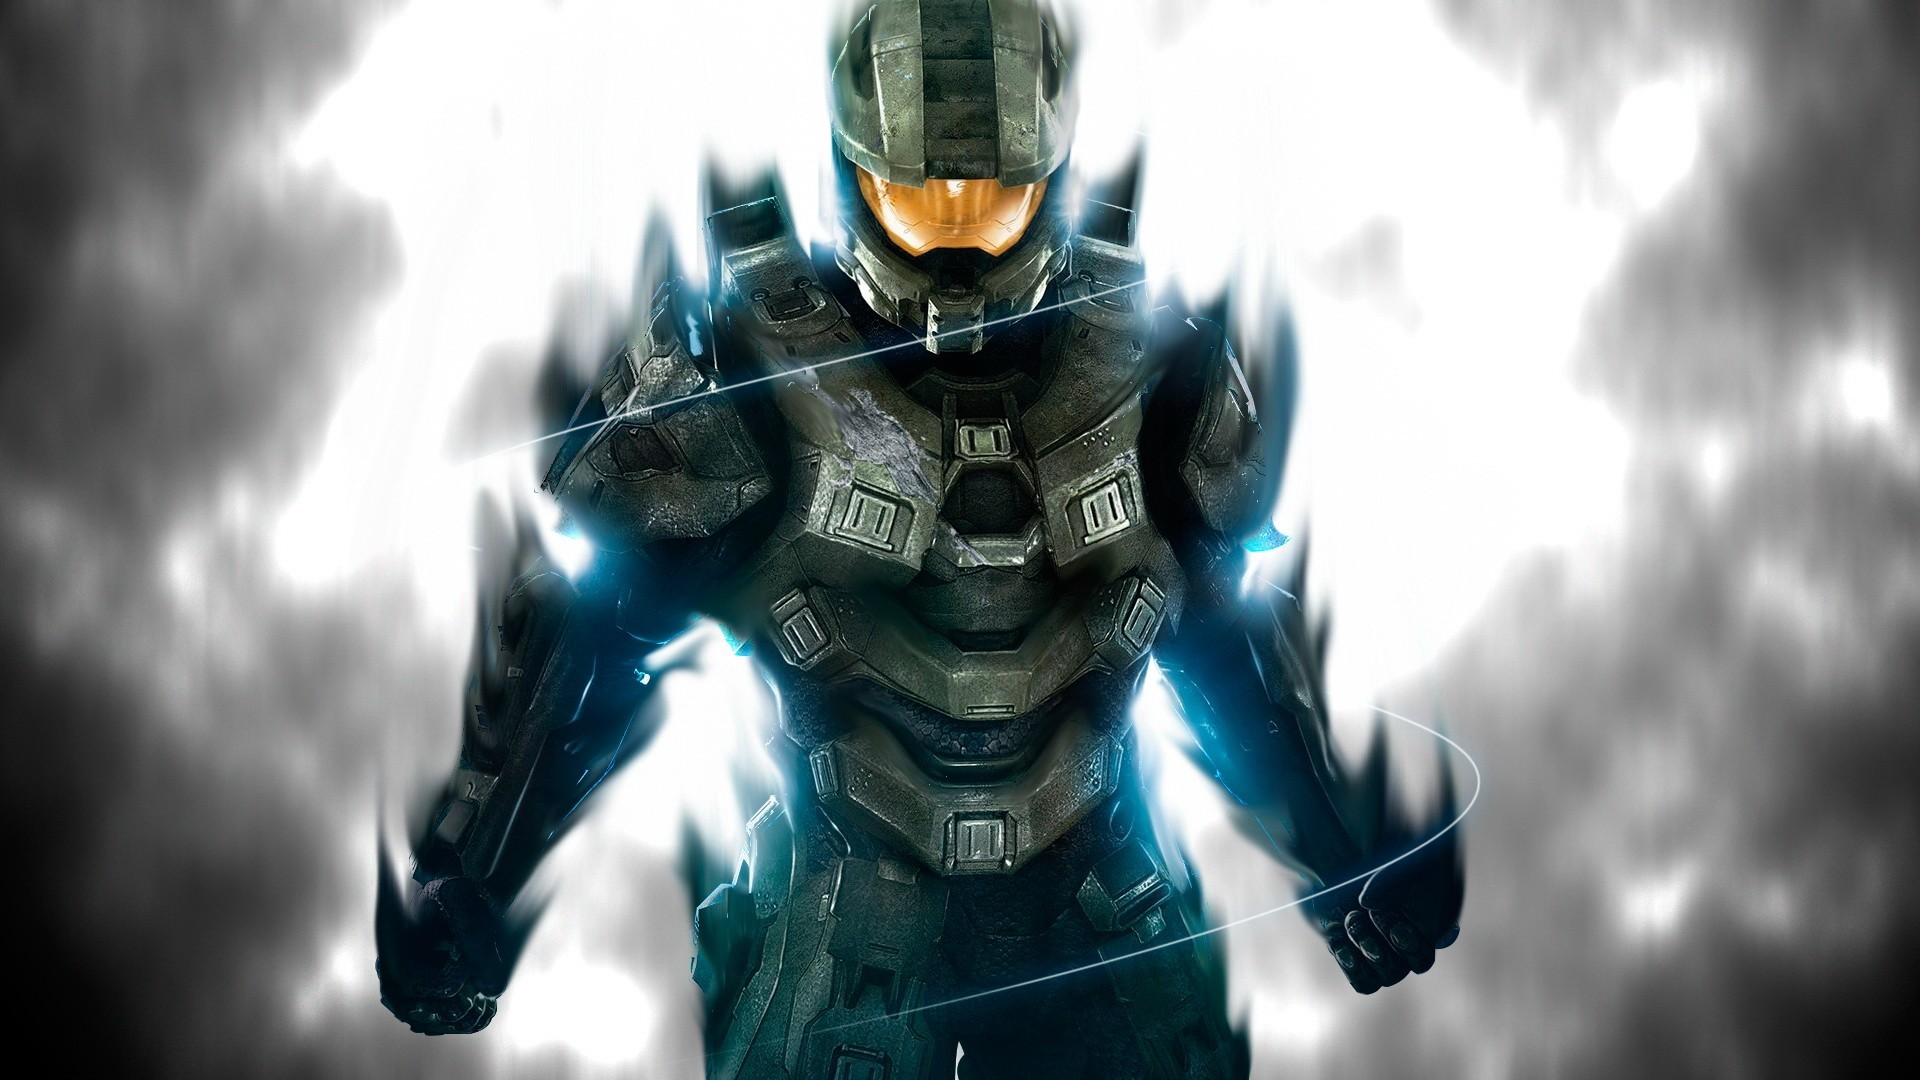 Master Chief – Halo 5 Guardians Wallpaper HD .